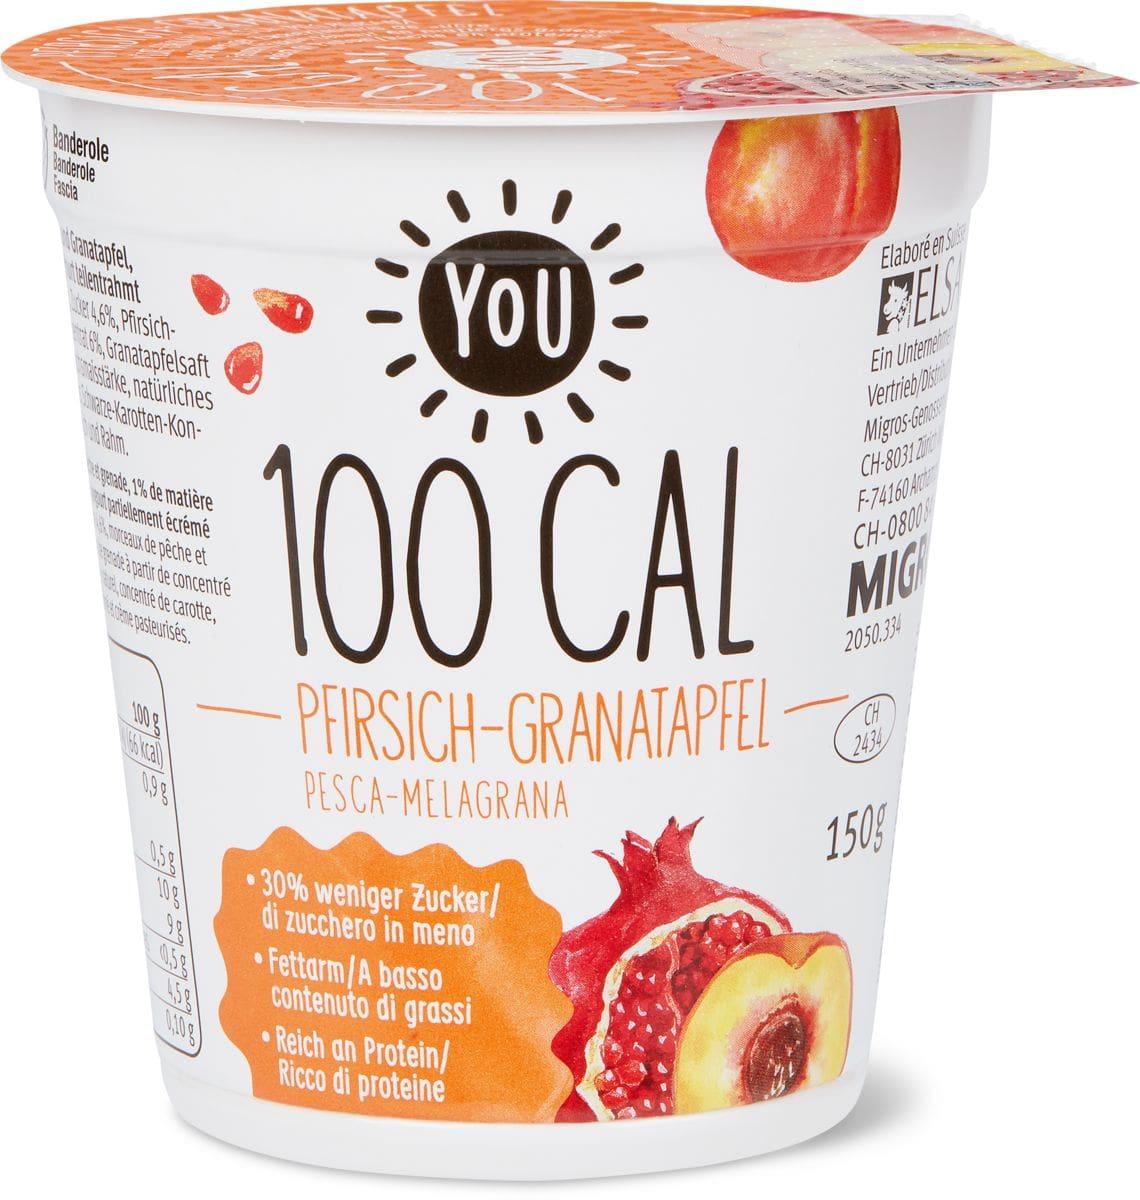 YOU 100Cal Pfirsich-Granatapfel